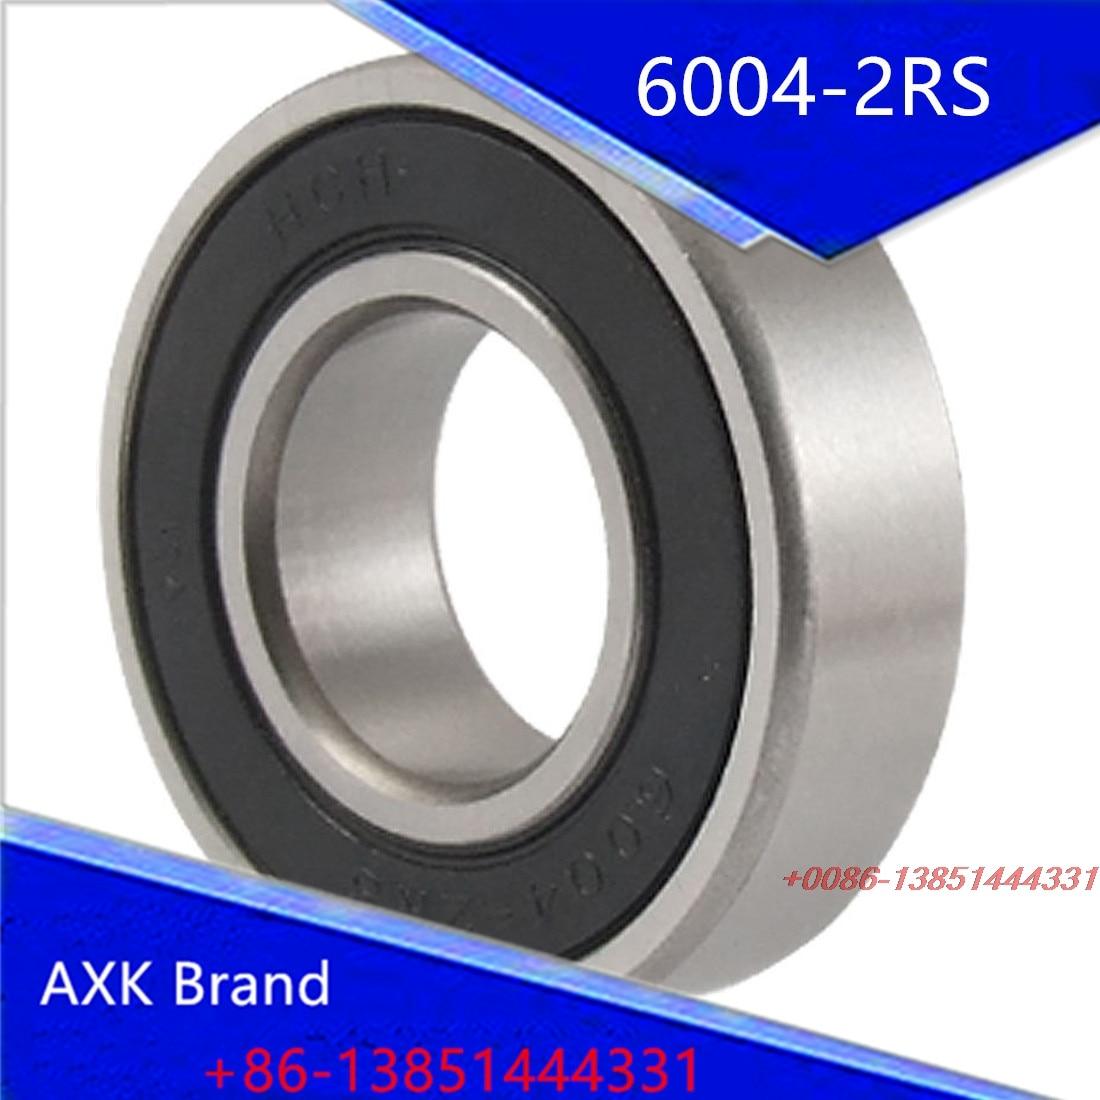 AXK 6004-2RS Double Side Sealed Ball Bearing 20mm x 42mm x 12mm холодильник side by side samsung rs 552 nrua1j